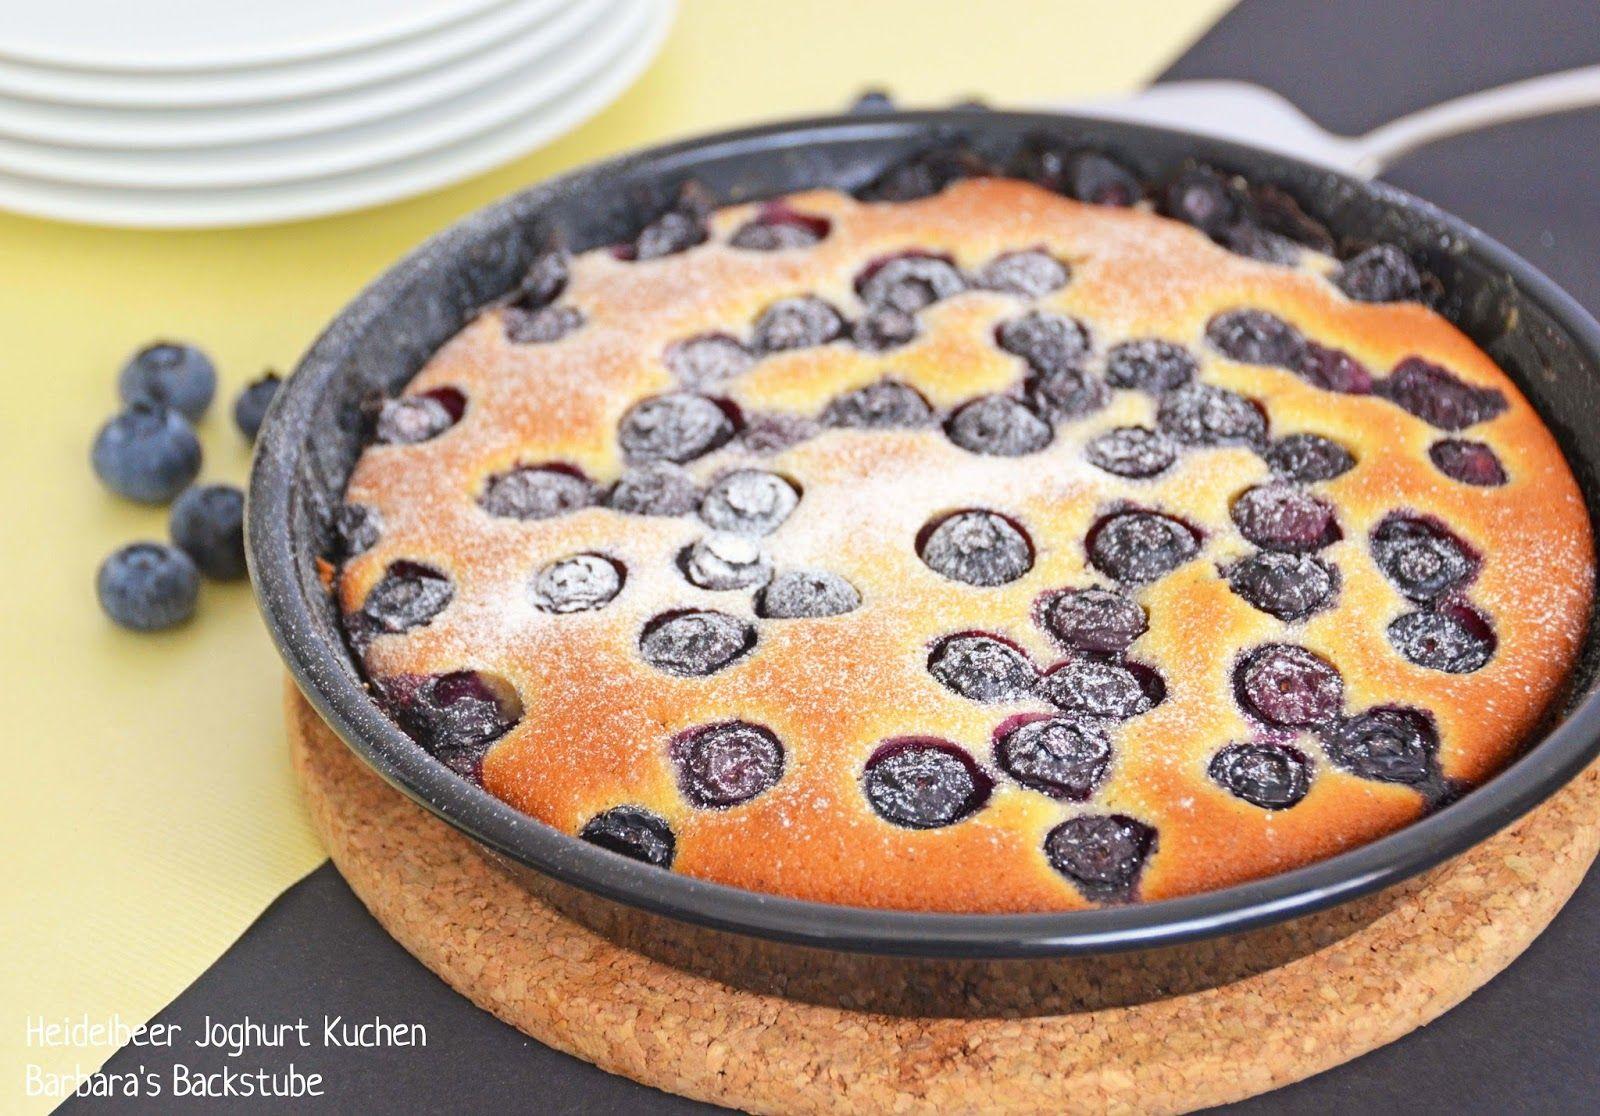 Barbara's Backstube: Heidelbeer Joghurt Kuchen